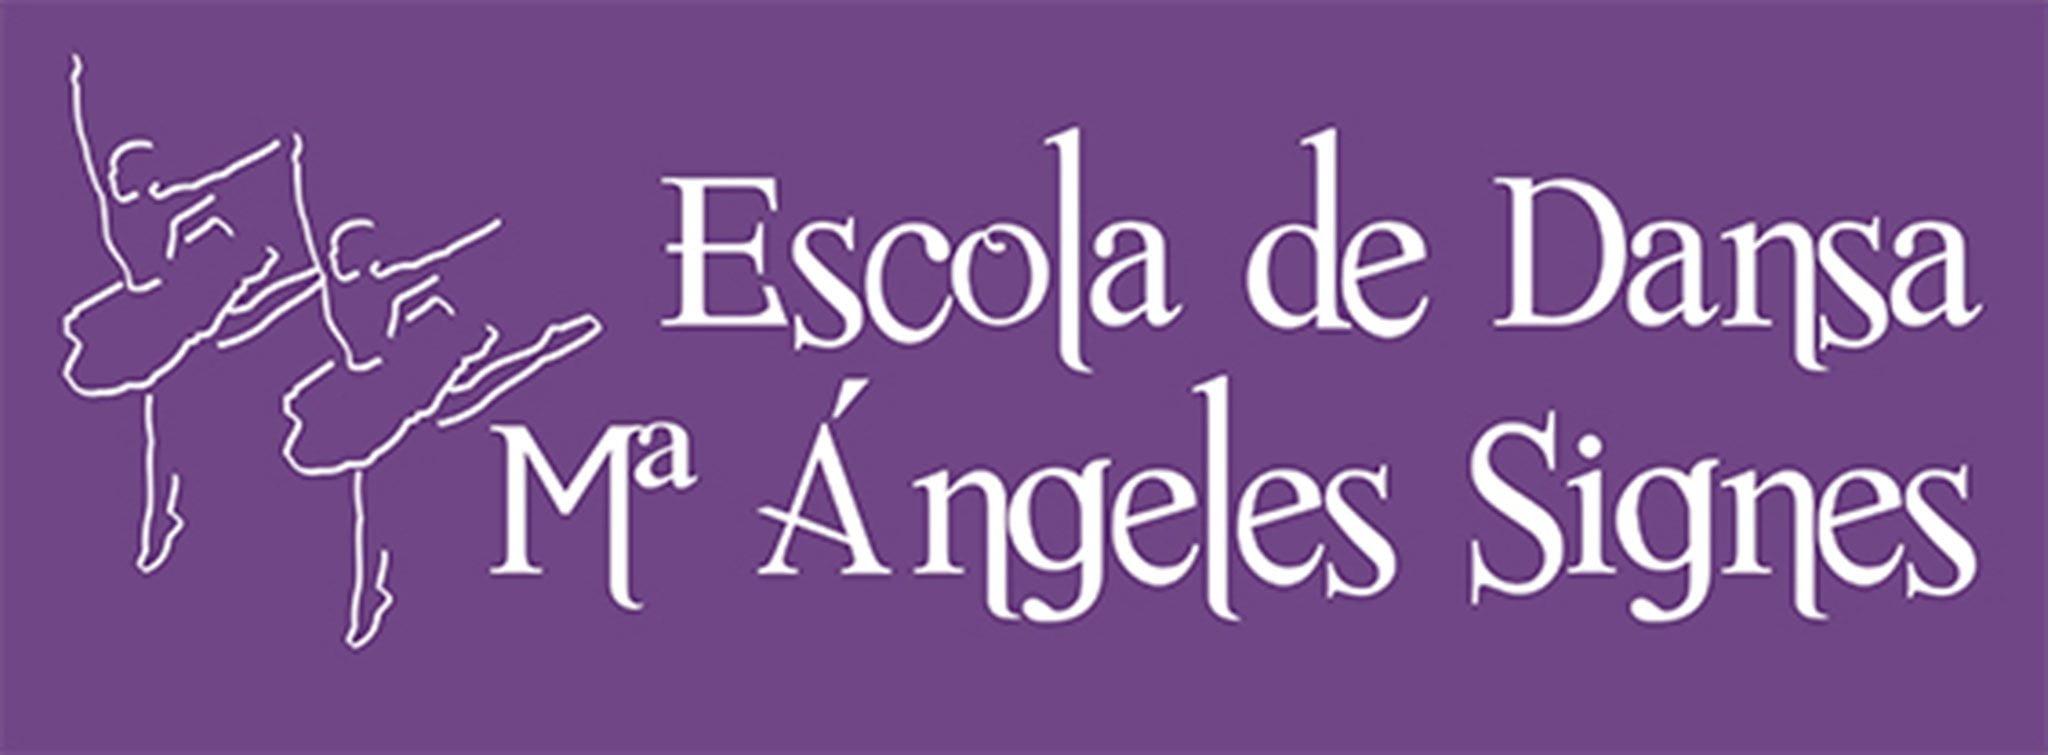 Logotipo de Escola de Dansa Mª Ángeles Signes